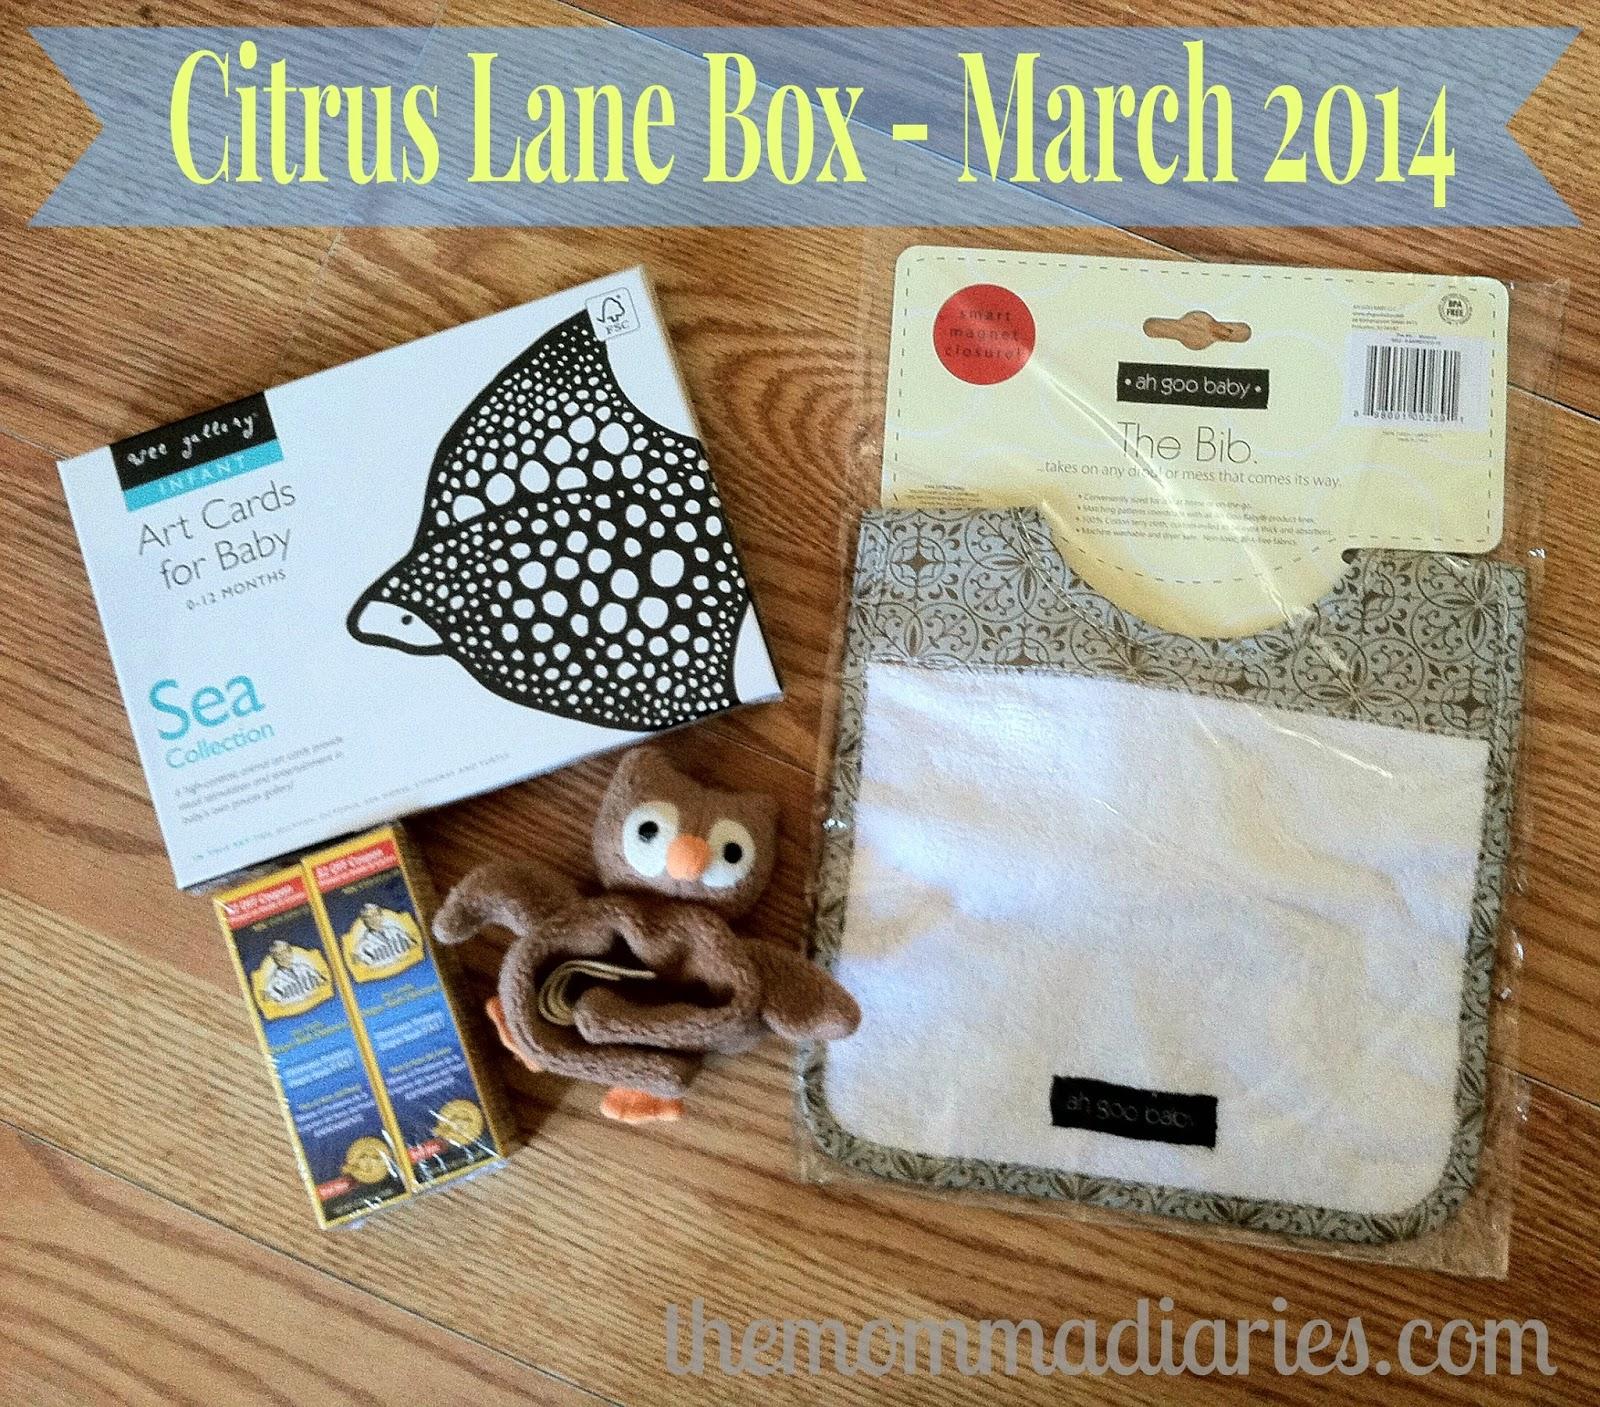 Citrus Lane Box March 2014